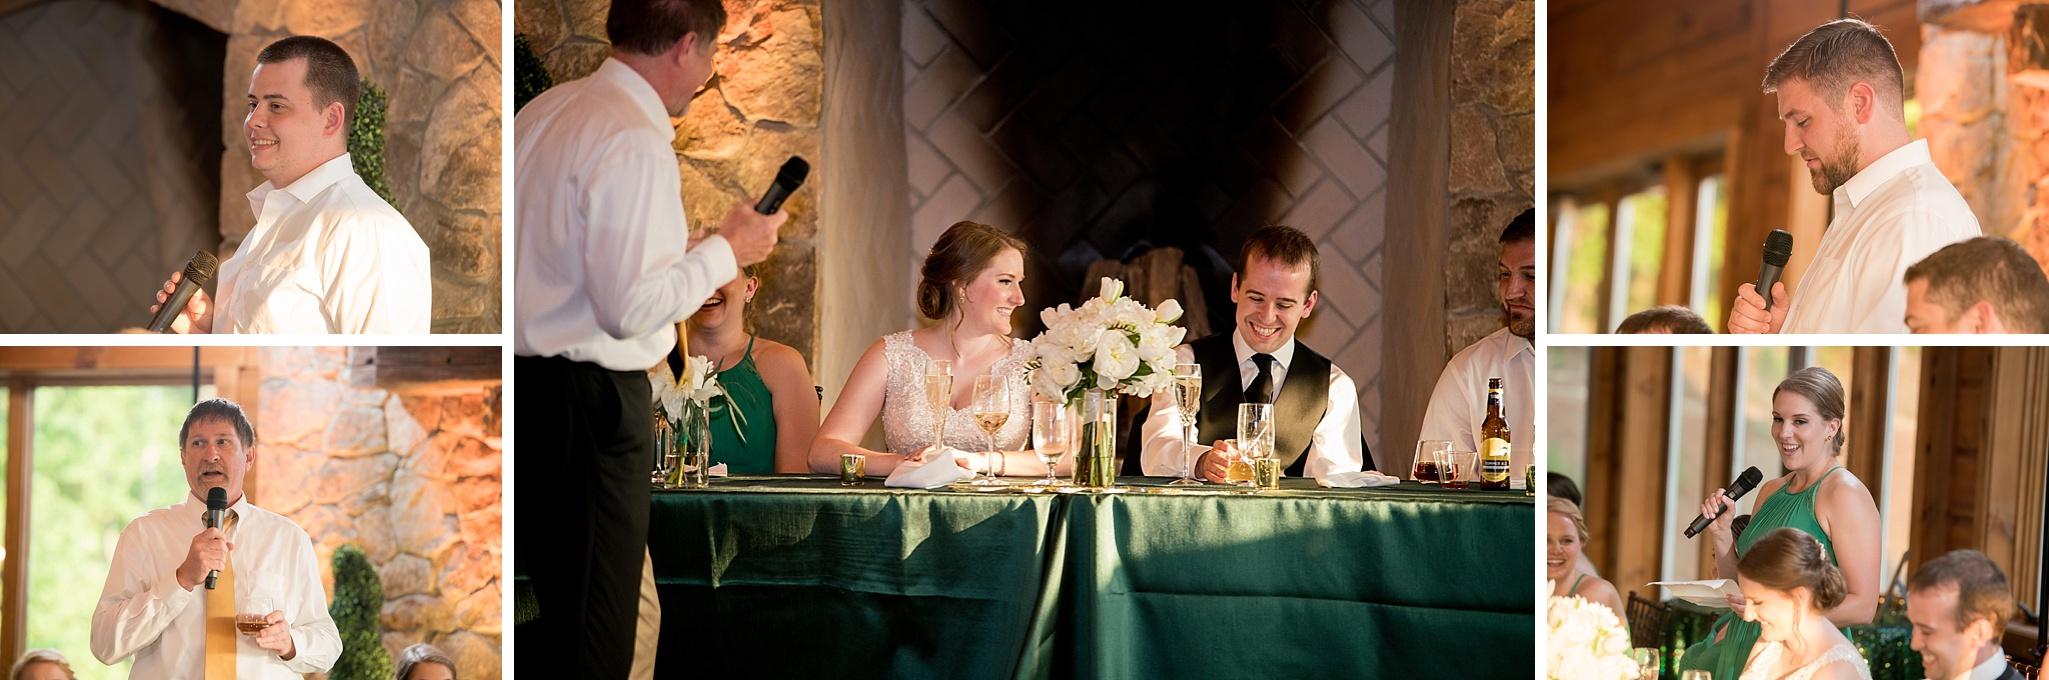 Pavilion-Carriage-Farms-Wedding-Photographer-220.jpg